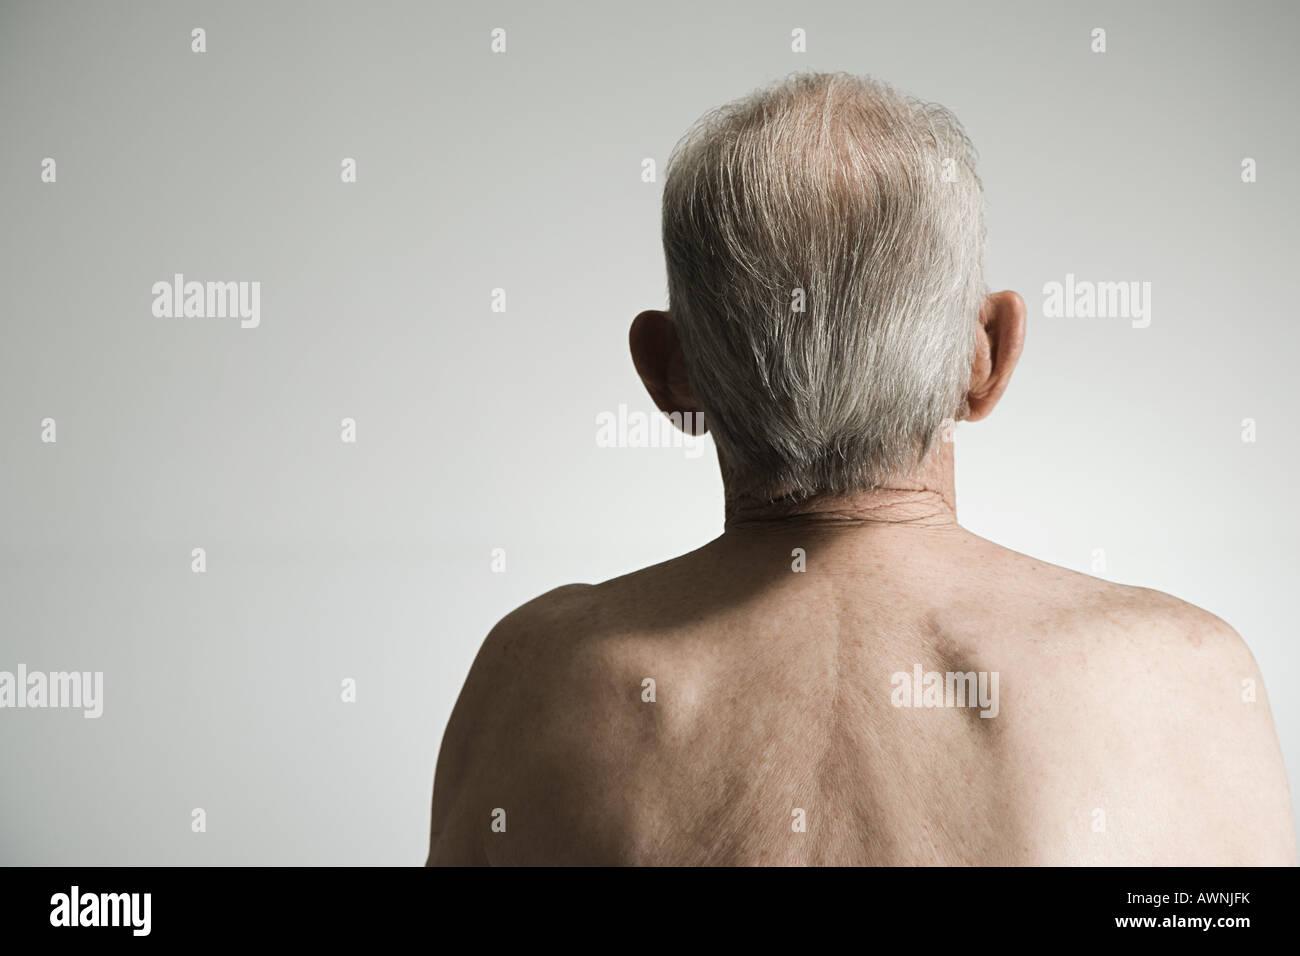 Rear view of a senior man - Stock Image